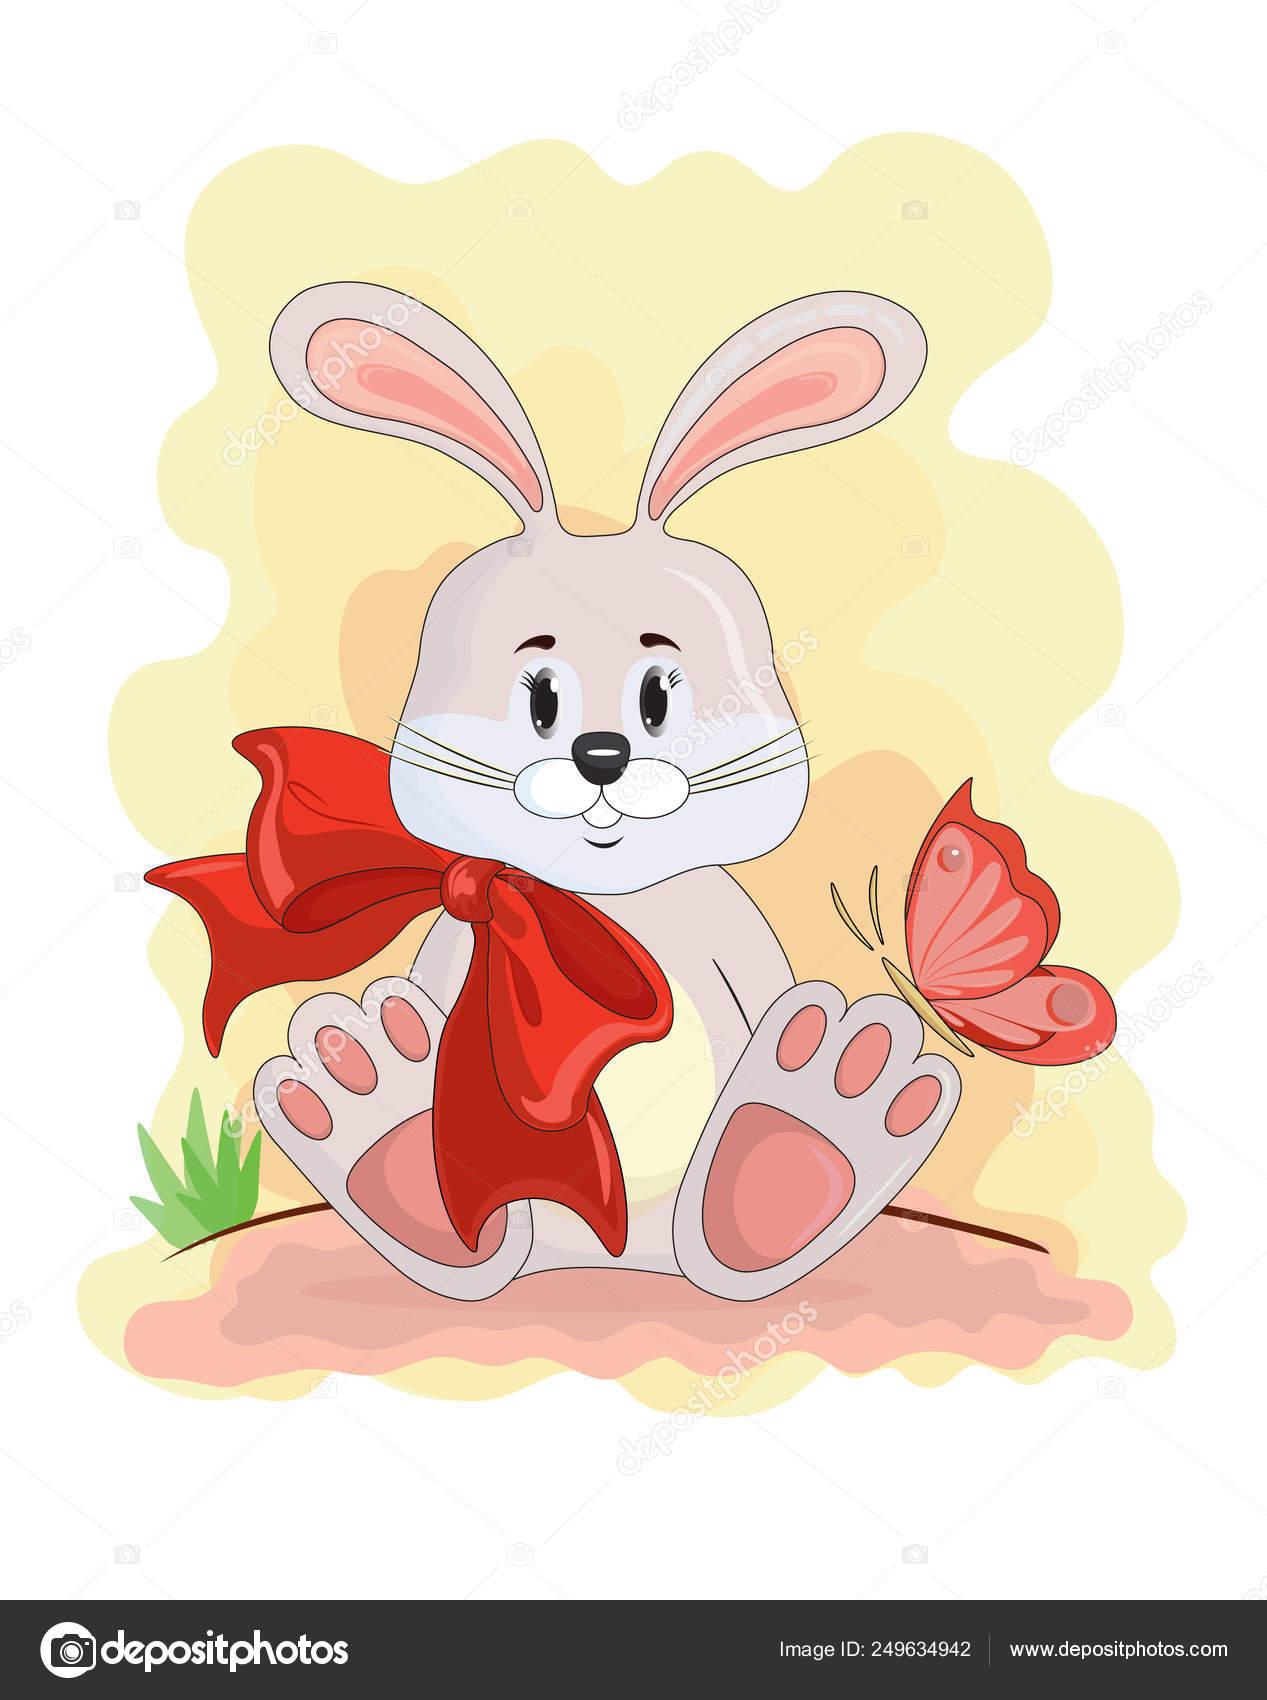 Mignon Lapin Dessin Anime Illustration Vectorielle Petit Lapin Image Vectorielle Kostenkoandrej30 Gmail Com C 249634942